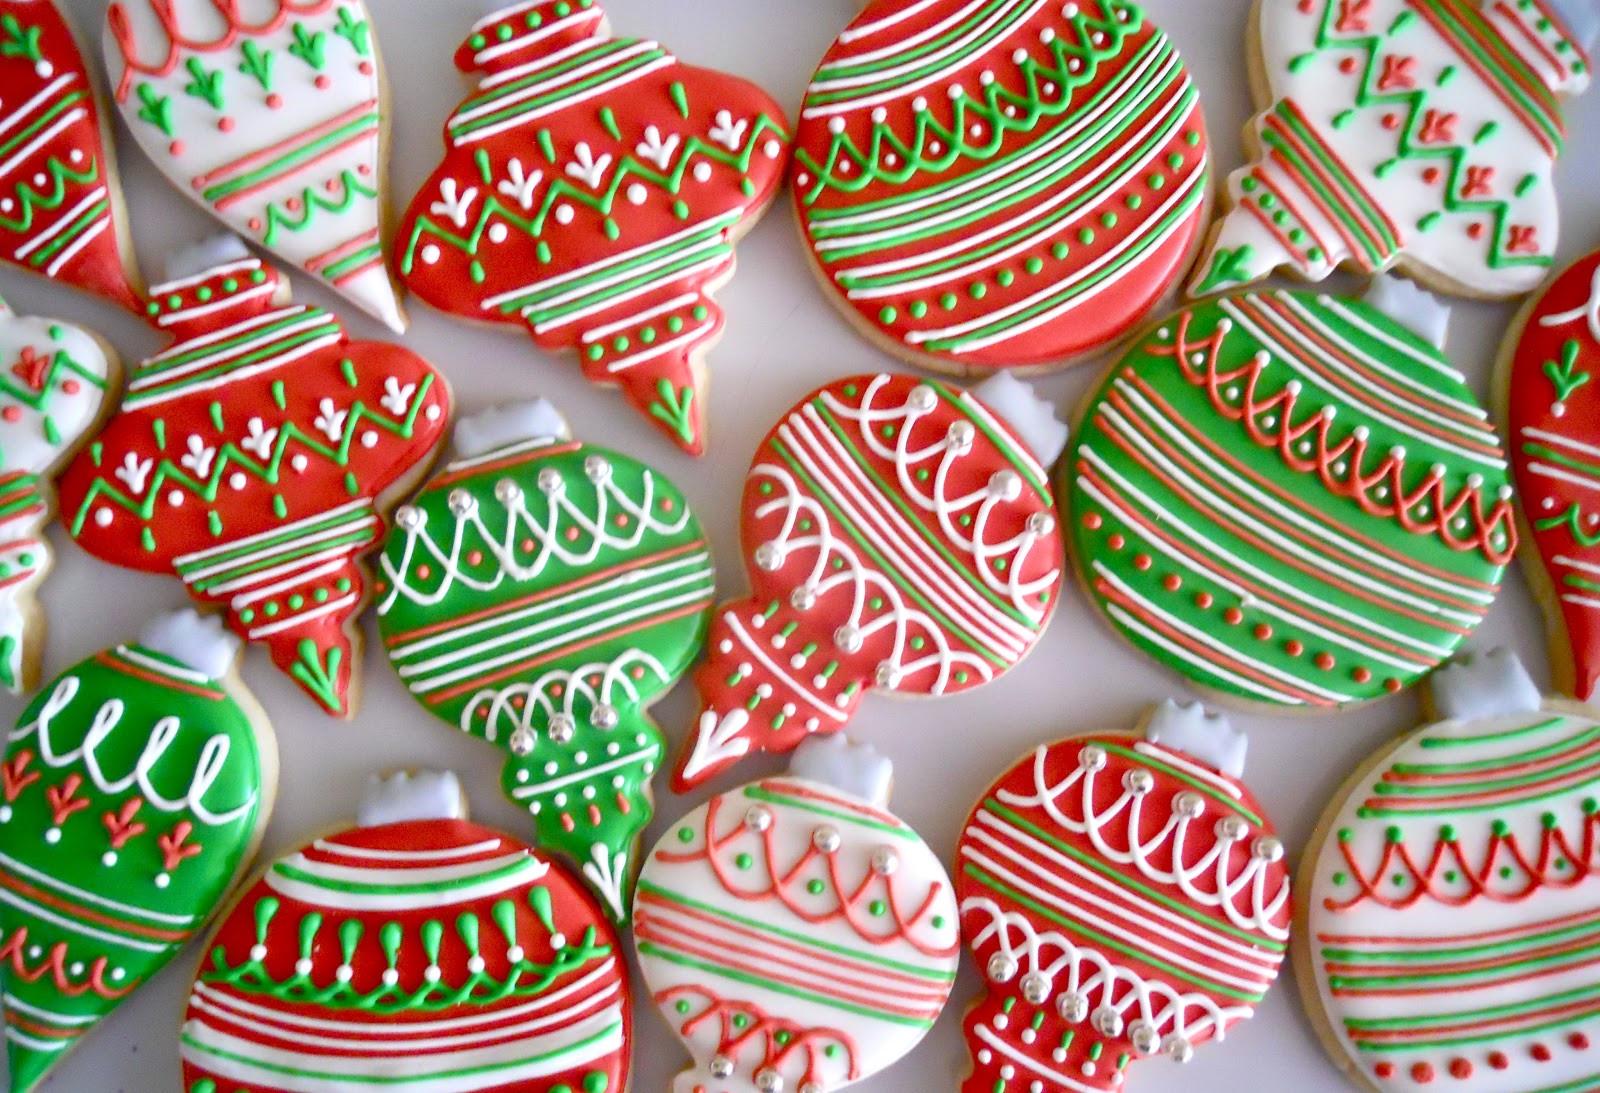 Baking Christmas Ornaments  Oh Sugar Events Christmas Ornaments